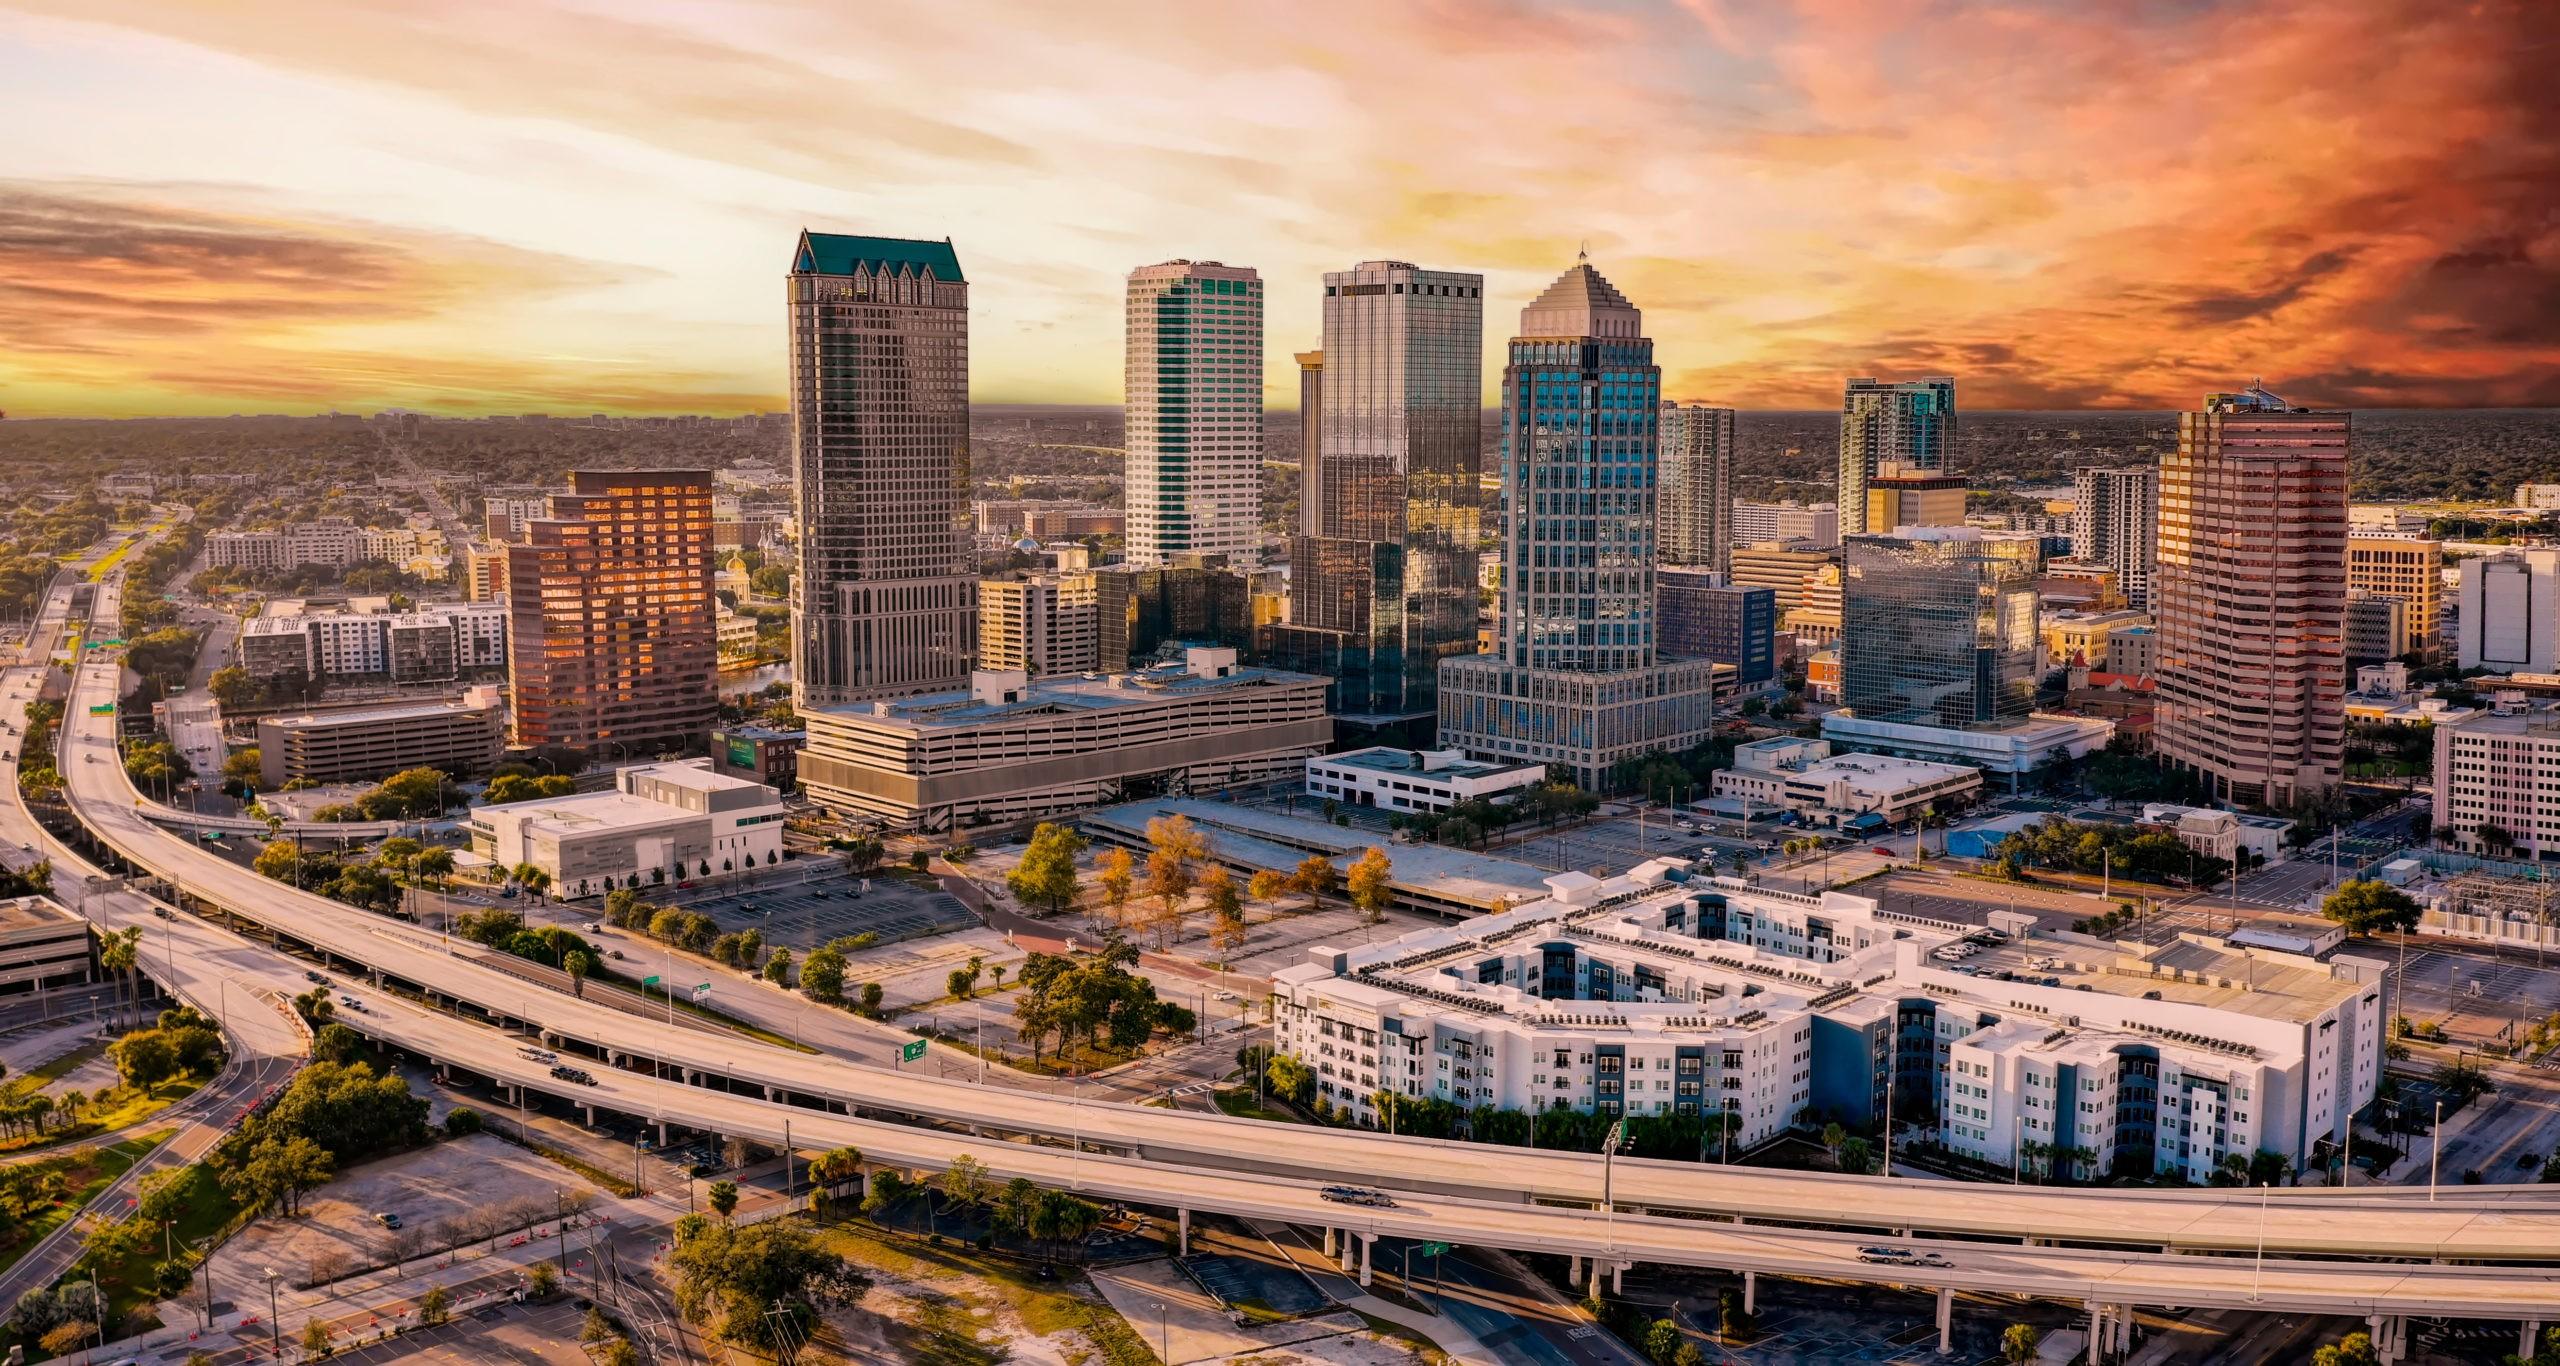 Architektura centrum miasta Tampa na Florydzie, licencja: shutterstock/By Randy Kostichka